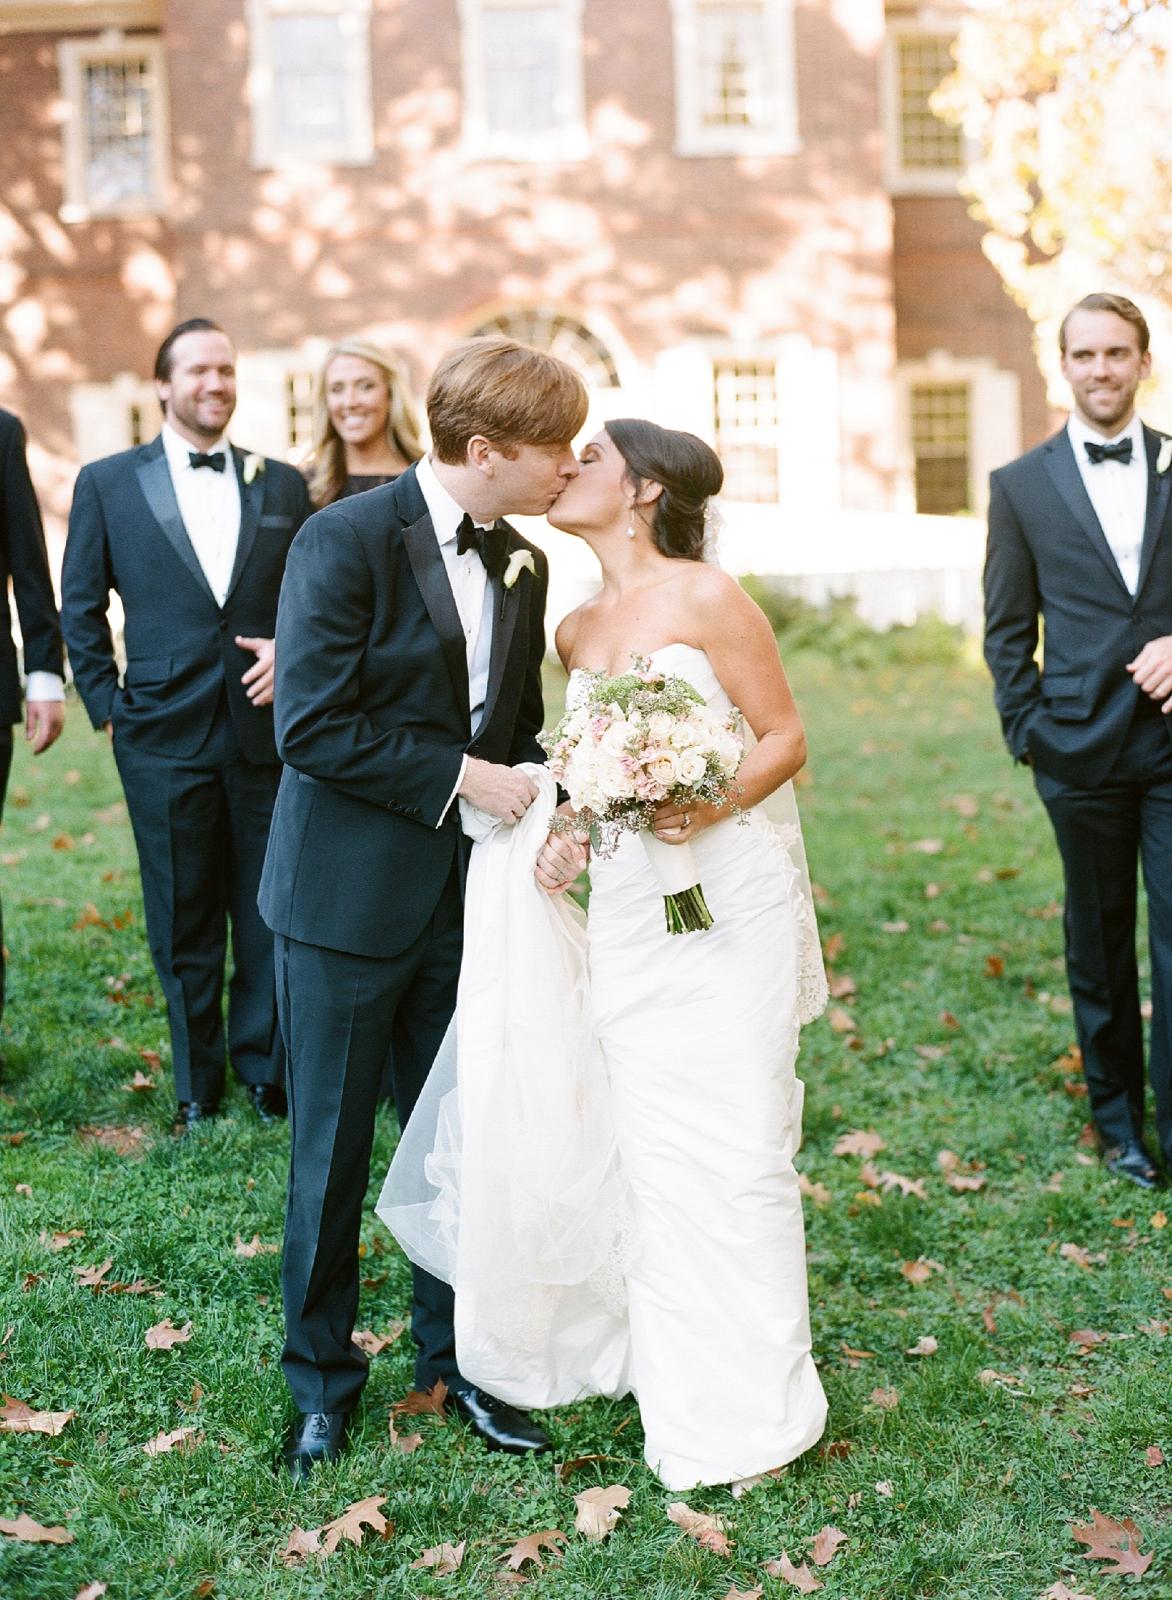 atrium at curtis center wedding photographer philadelphia wedding photographer shannon griffin_0059.jpg